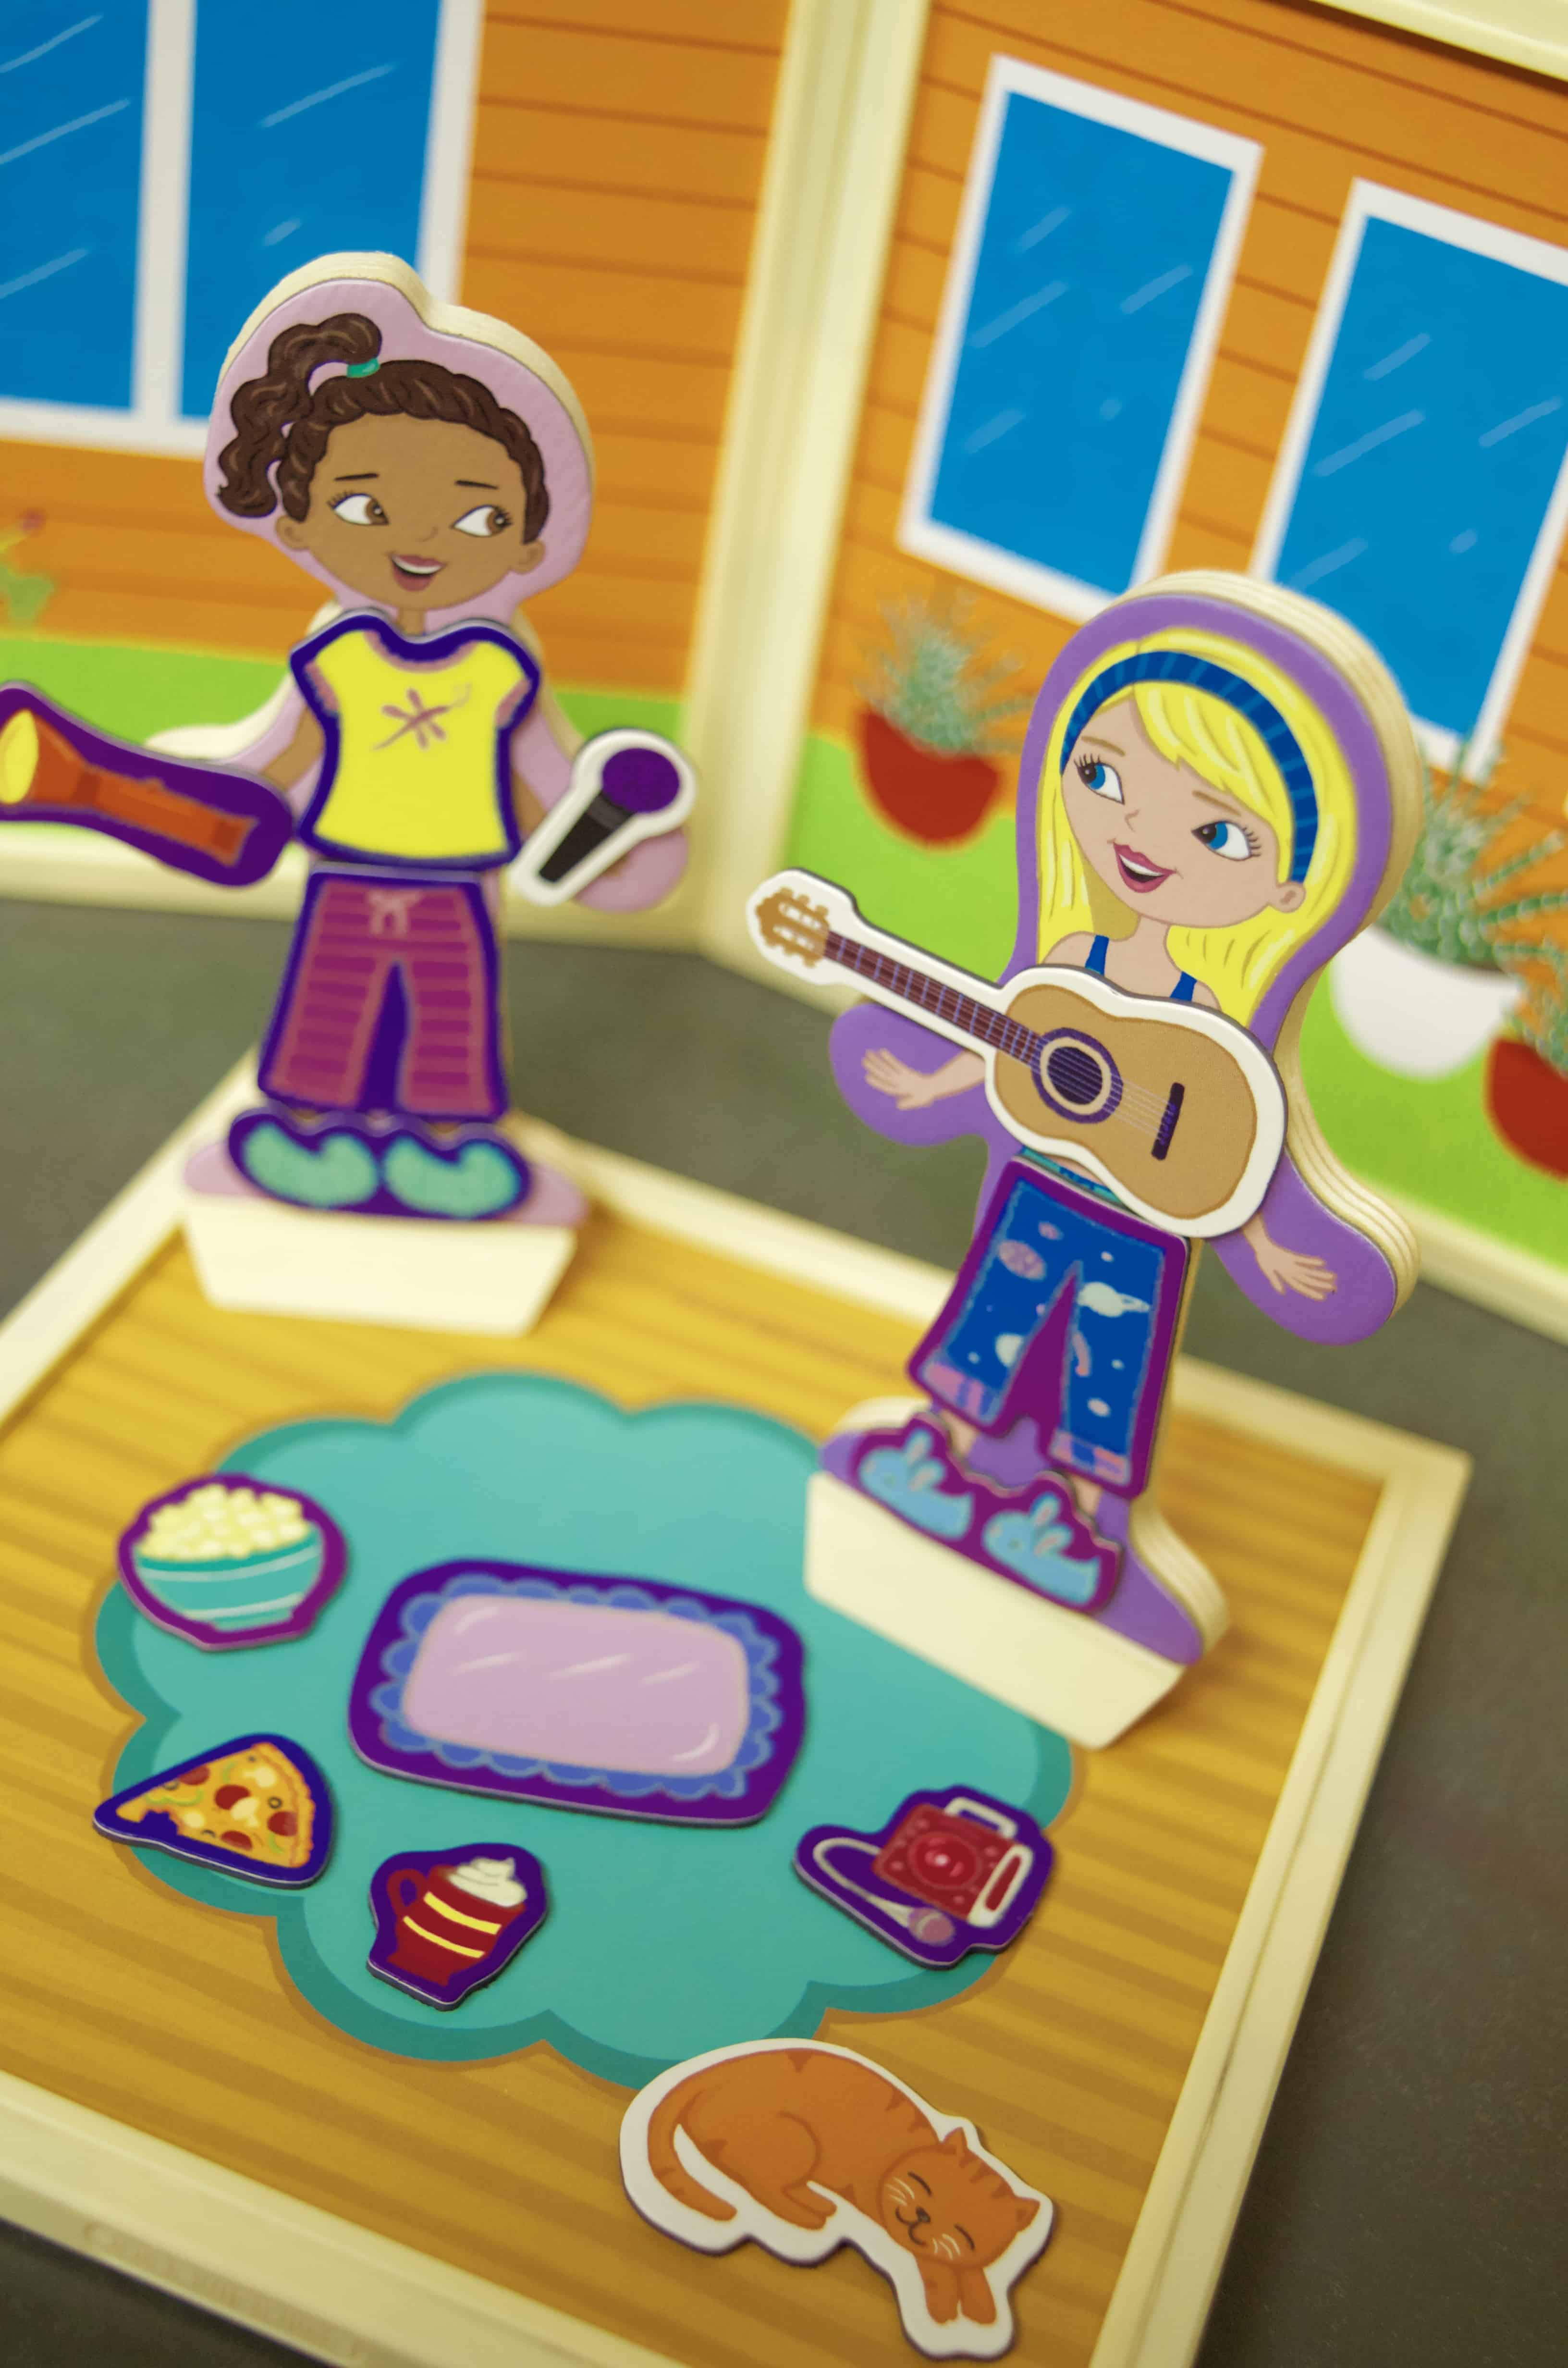 Build & Imagine Malia's House STEM Toy Review